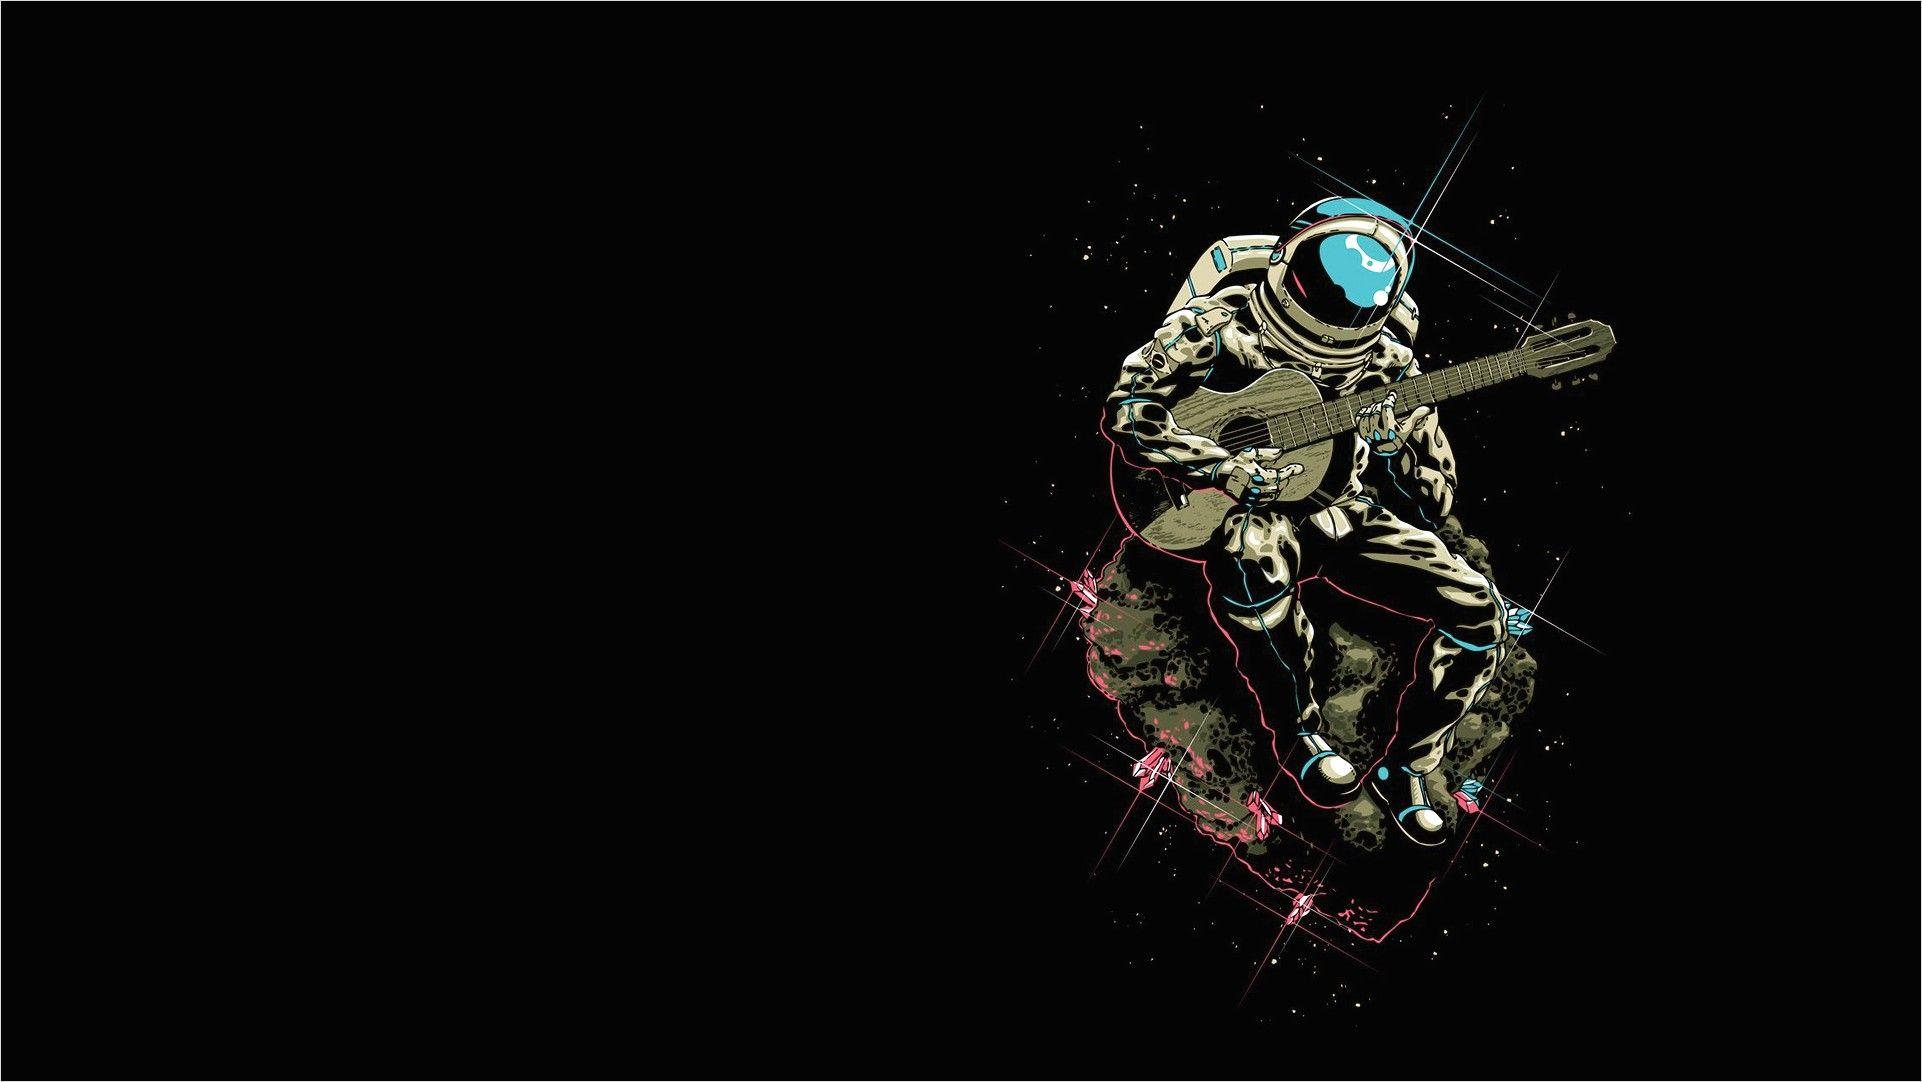 4k Astronaut Wallpaper 1920 X 1080 в 2020 г (с